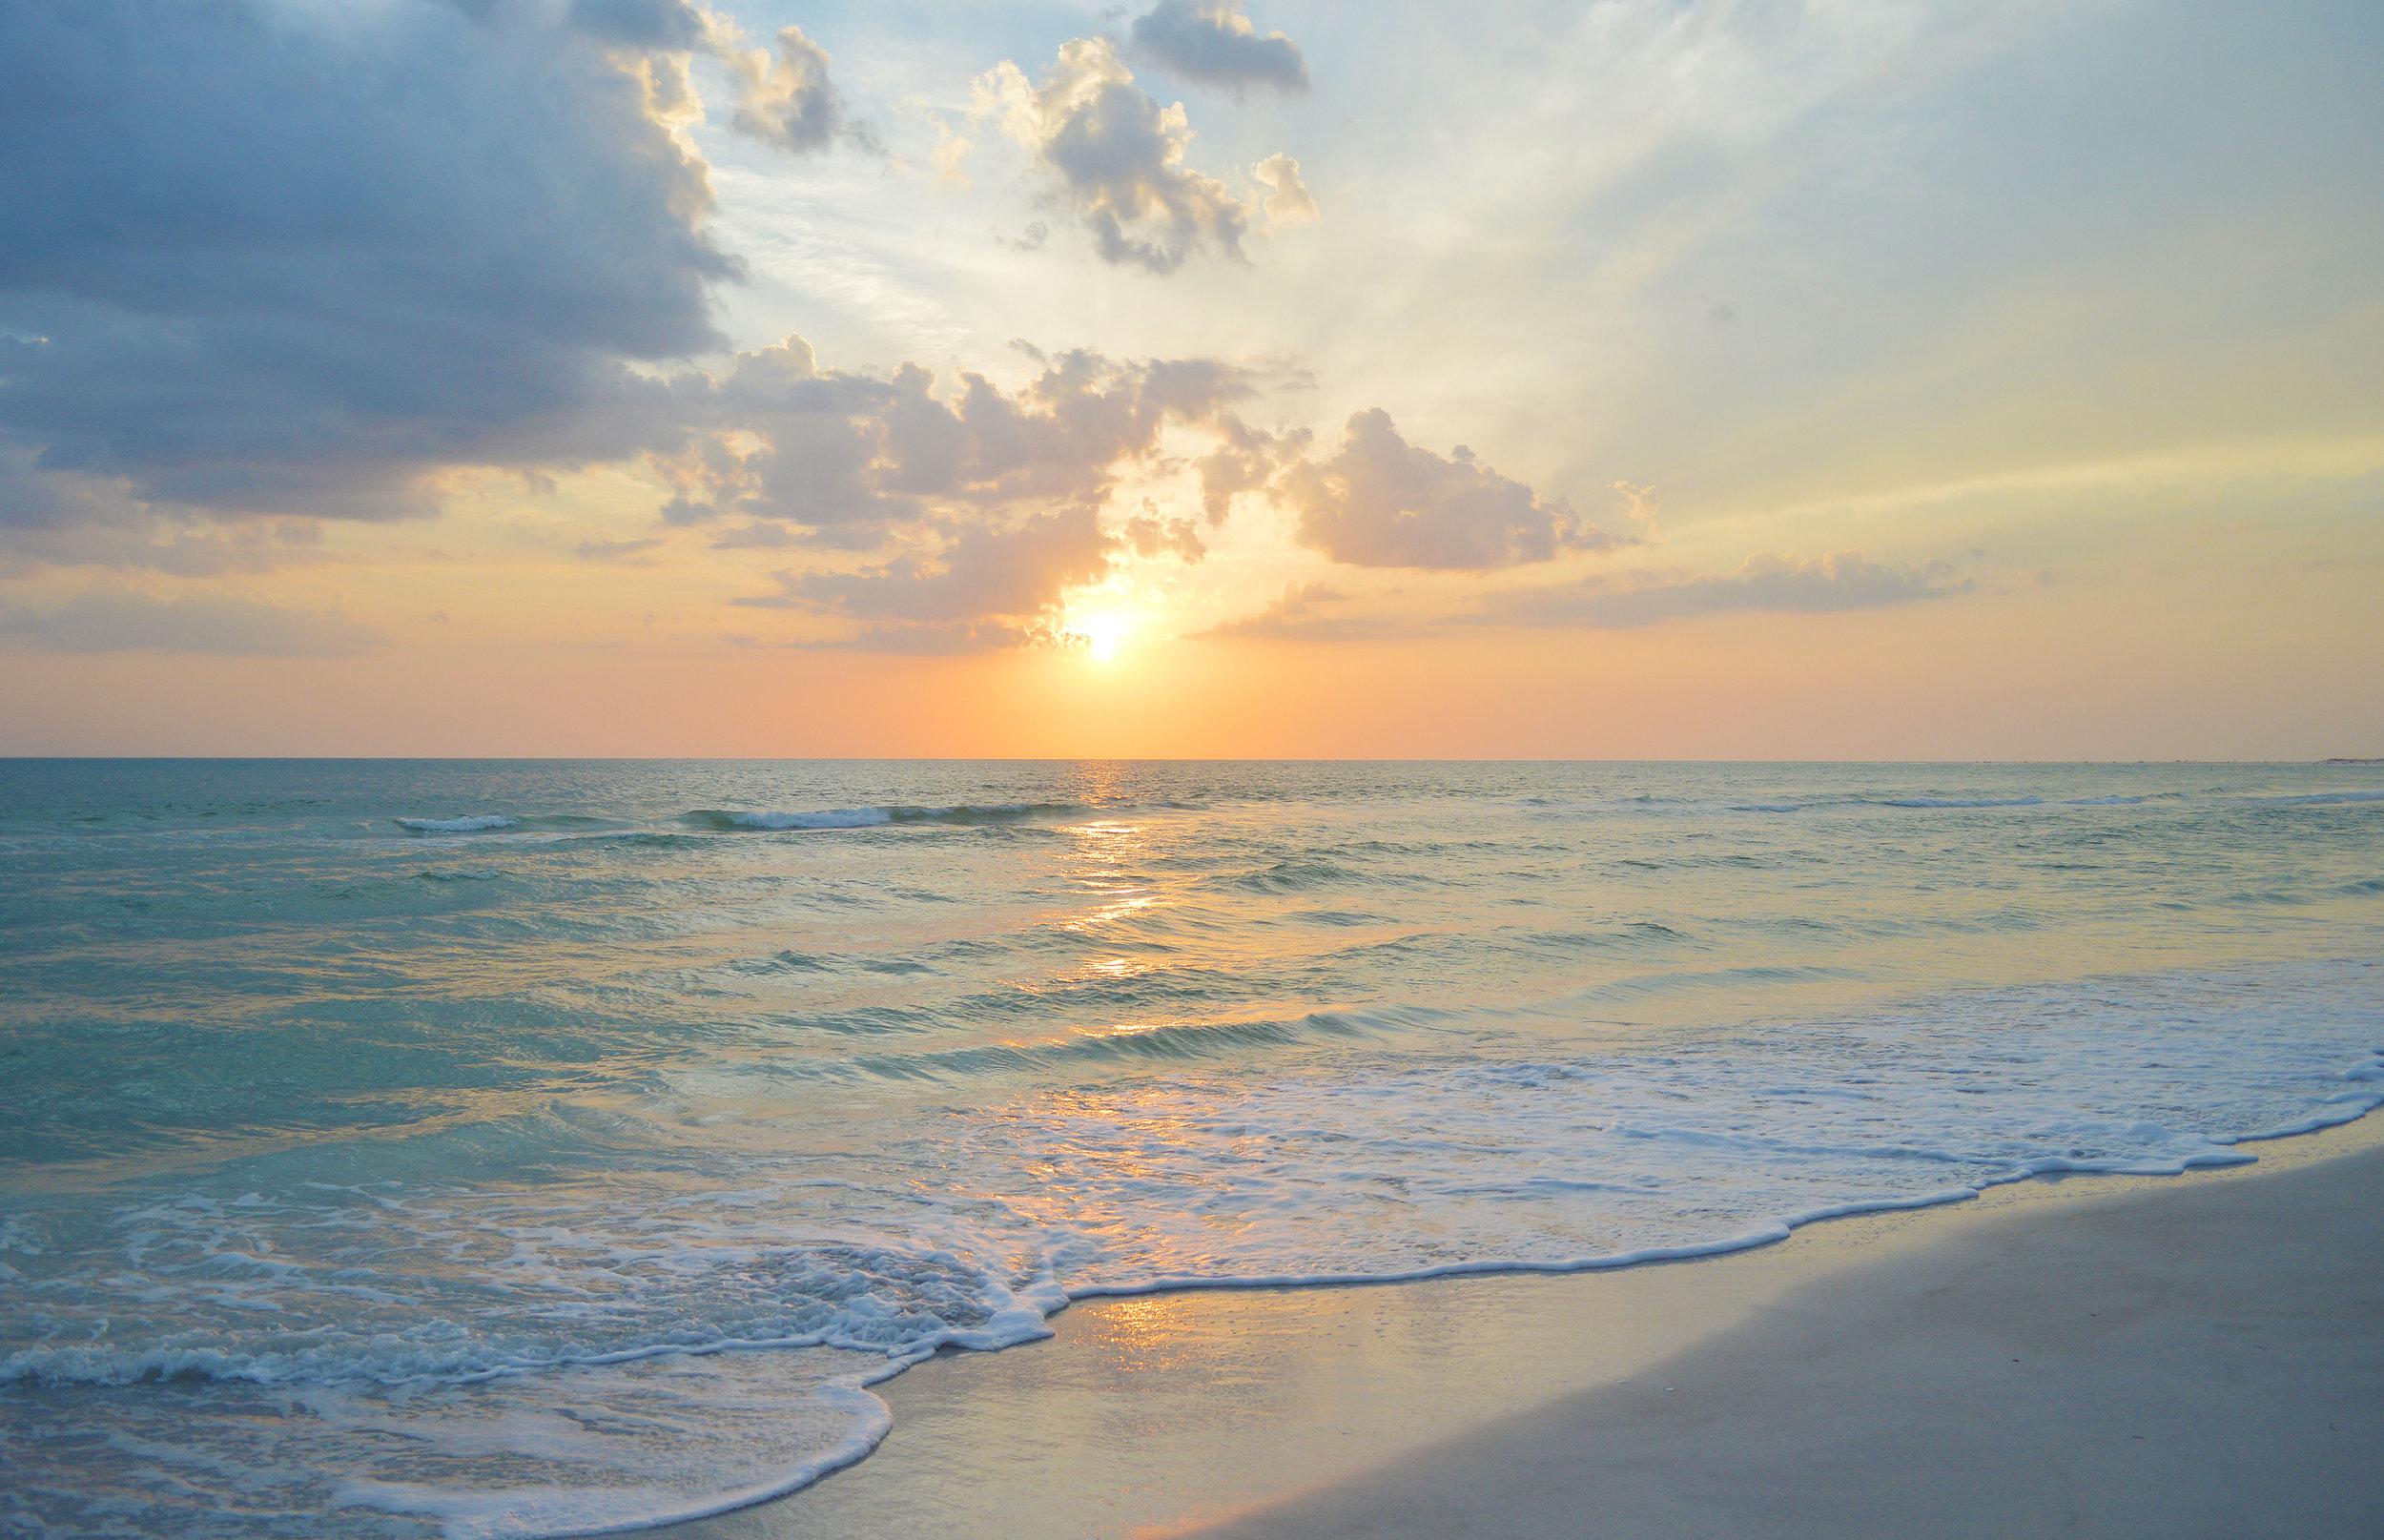 Lido Key Sarasota Florida Sunset Beach Photo by Kristen Laczu